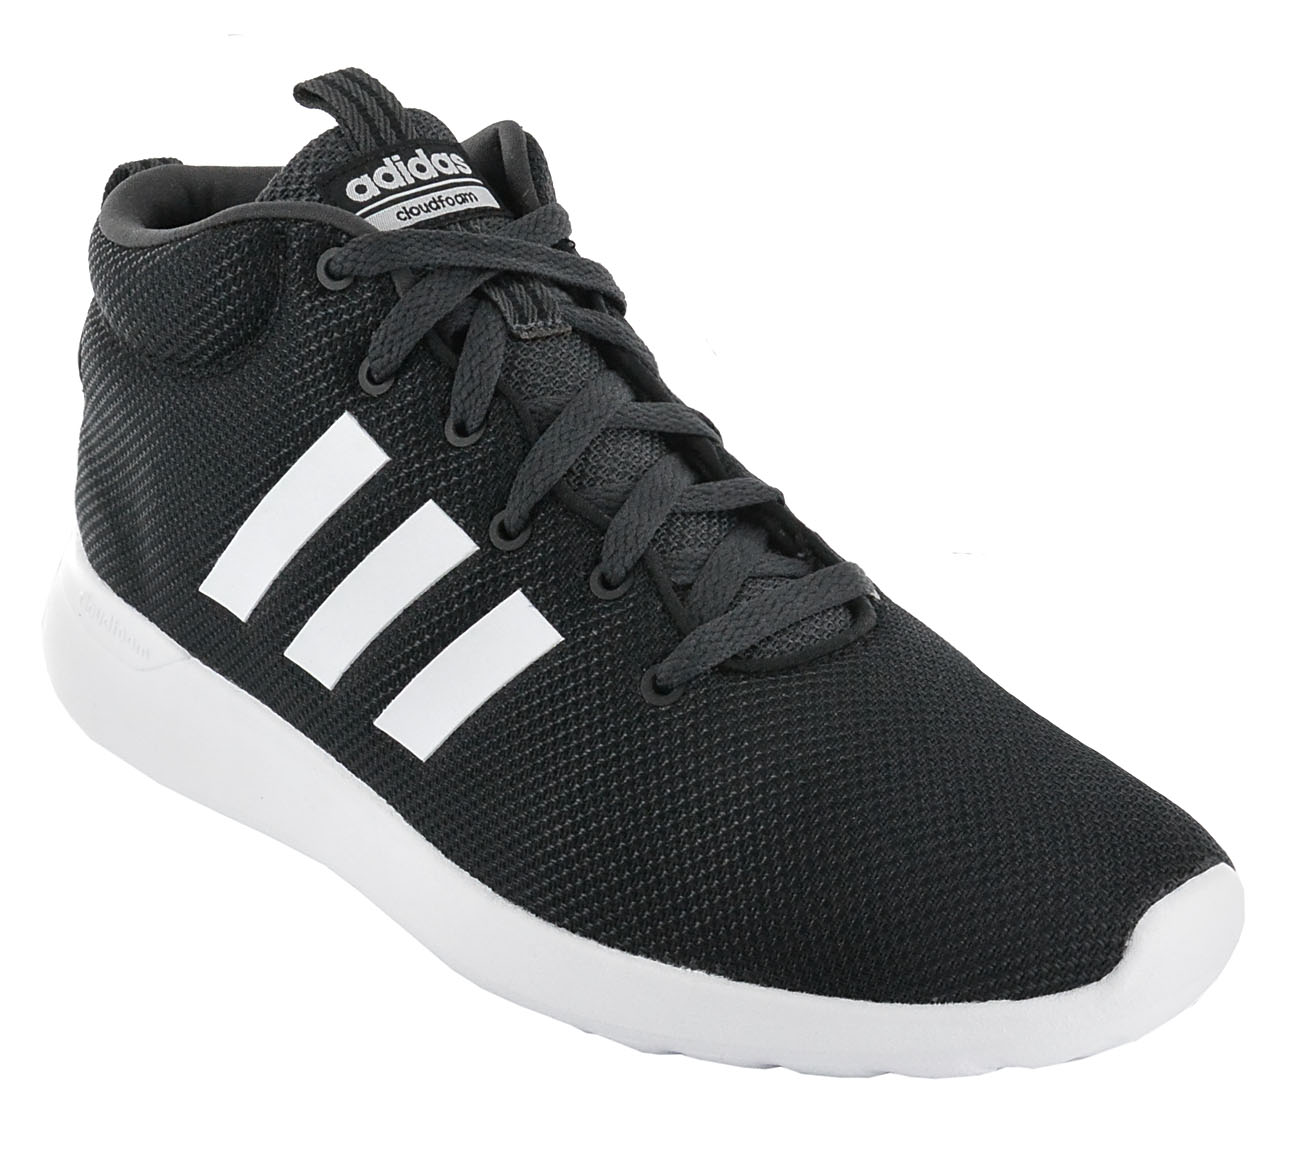 Details zu adidas Lite Racer Mid CF CloudFoam Schuhe Schwarz Herren Sneaker NEU BB9935